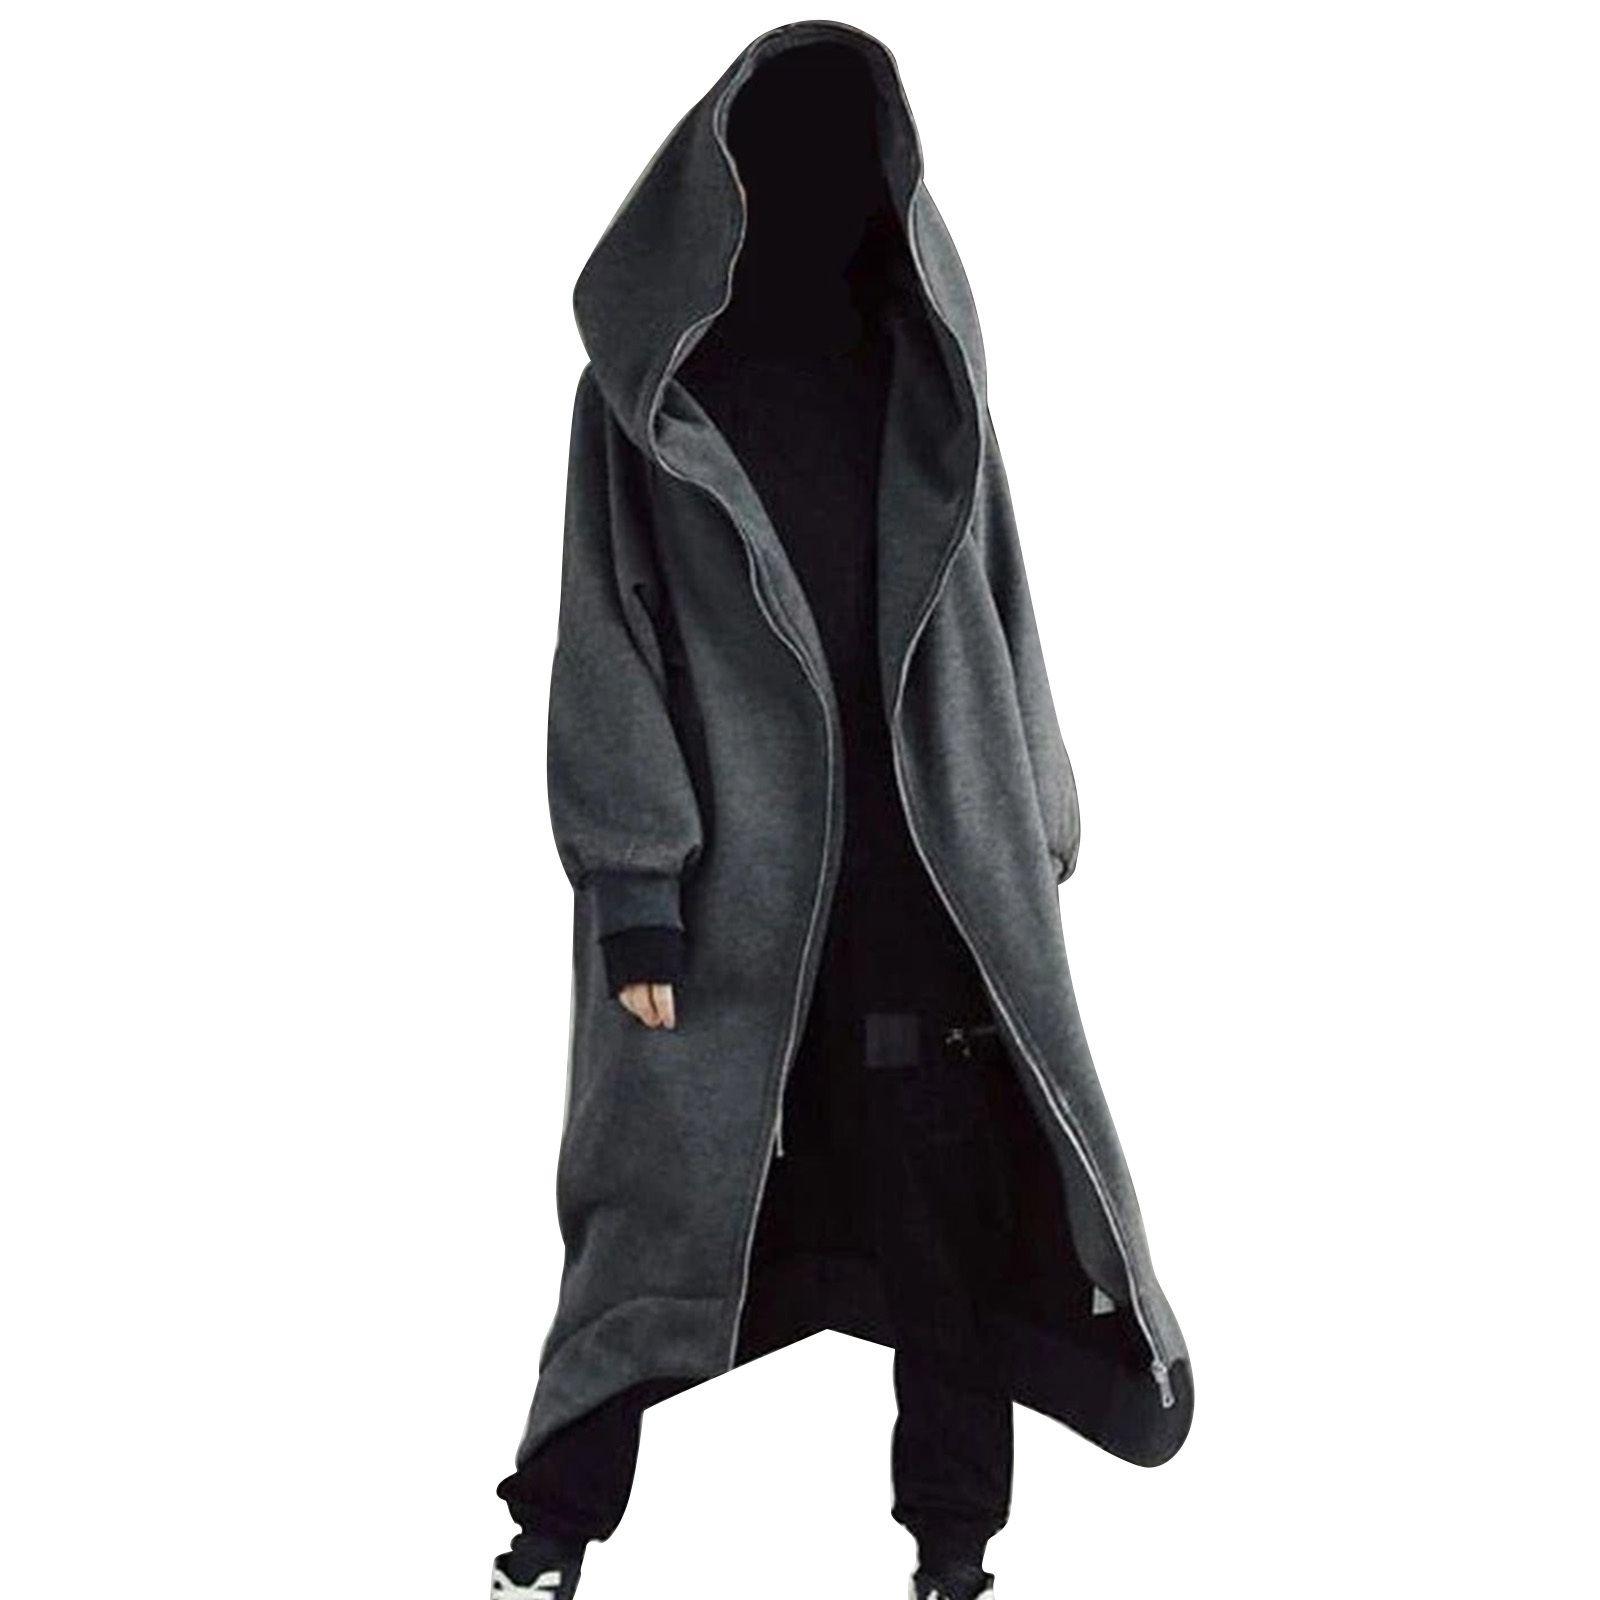 Mode Unisex Hülse mit Kapuze Nazgul Mantel Reißverschluss Fleece gesäumt Langer Hoodie warm warm